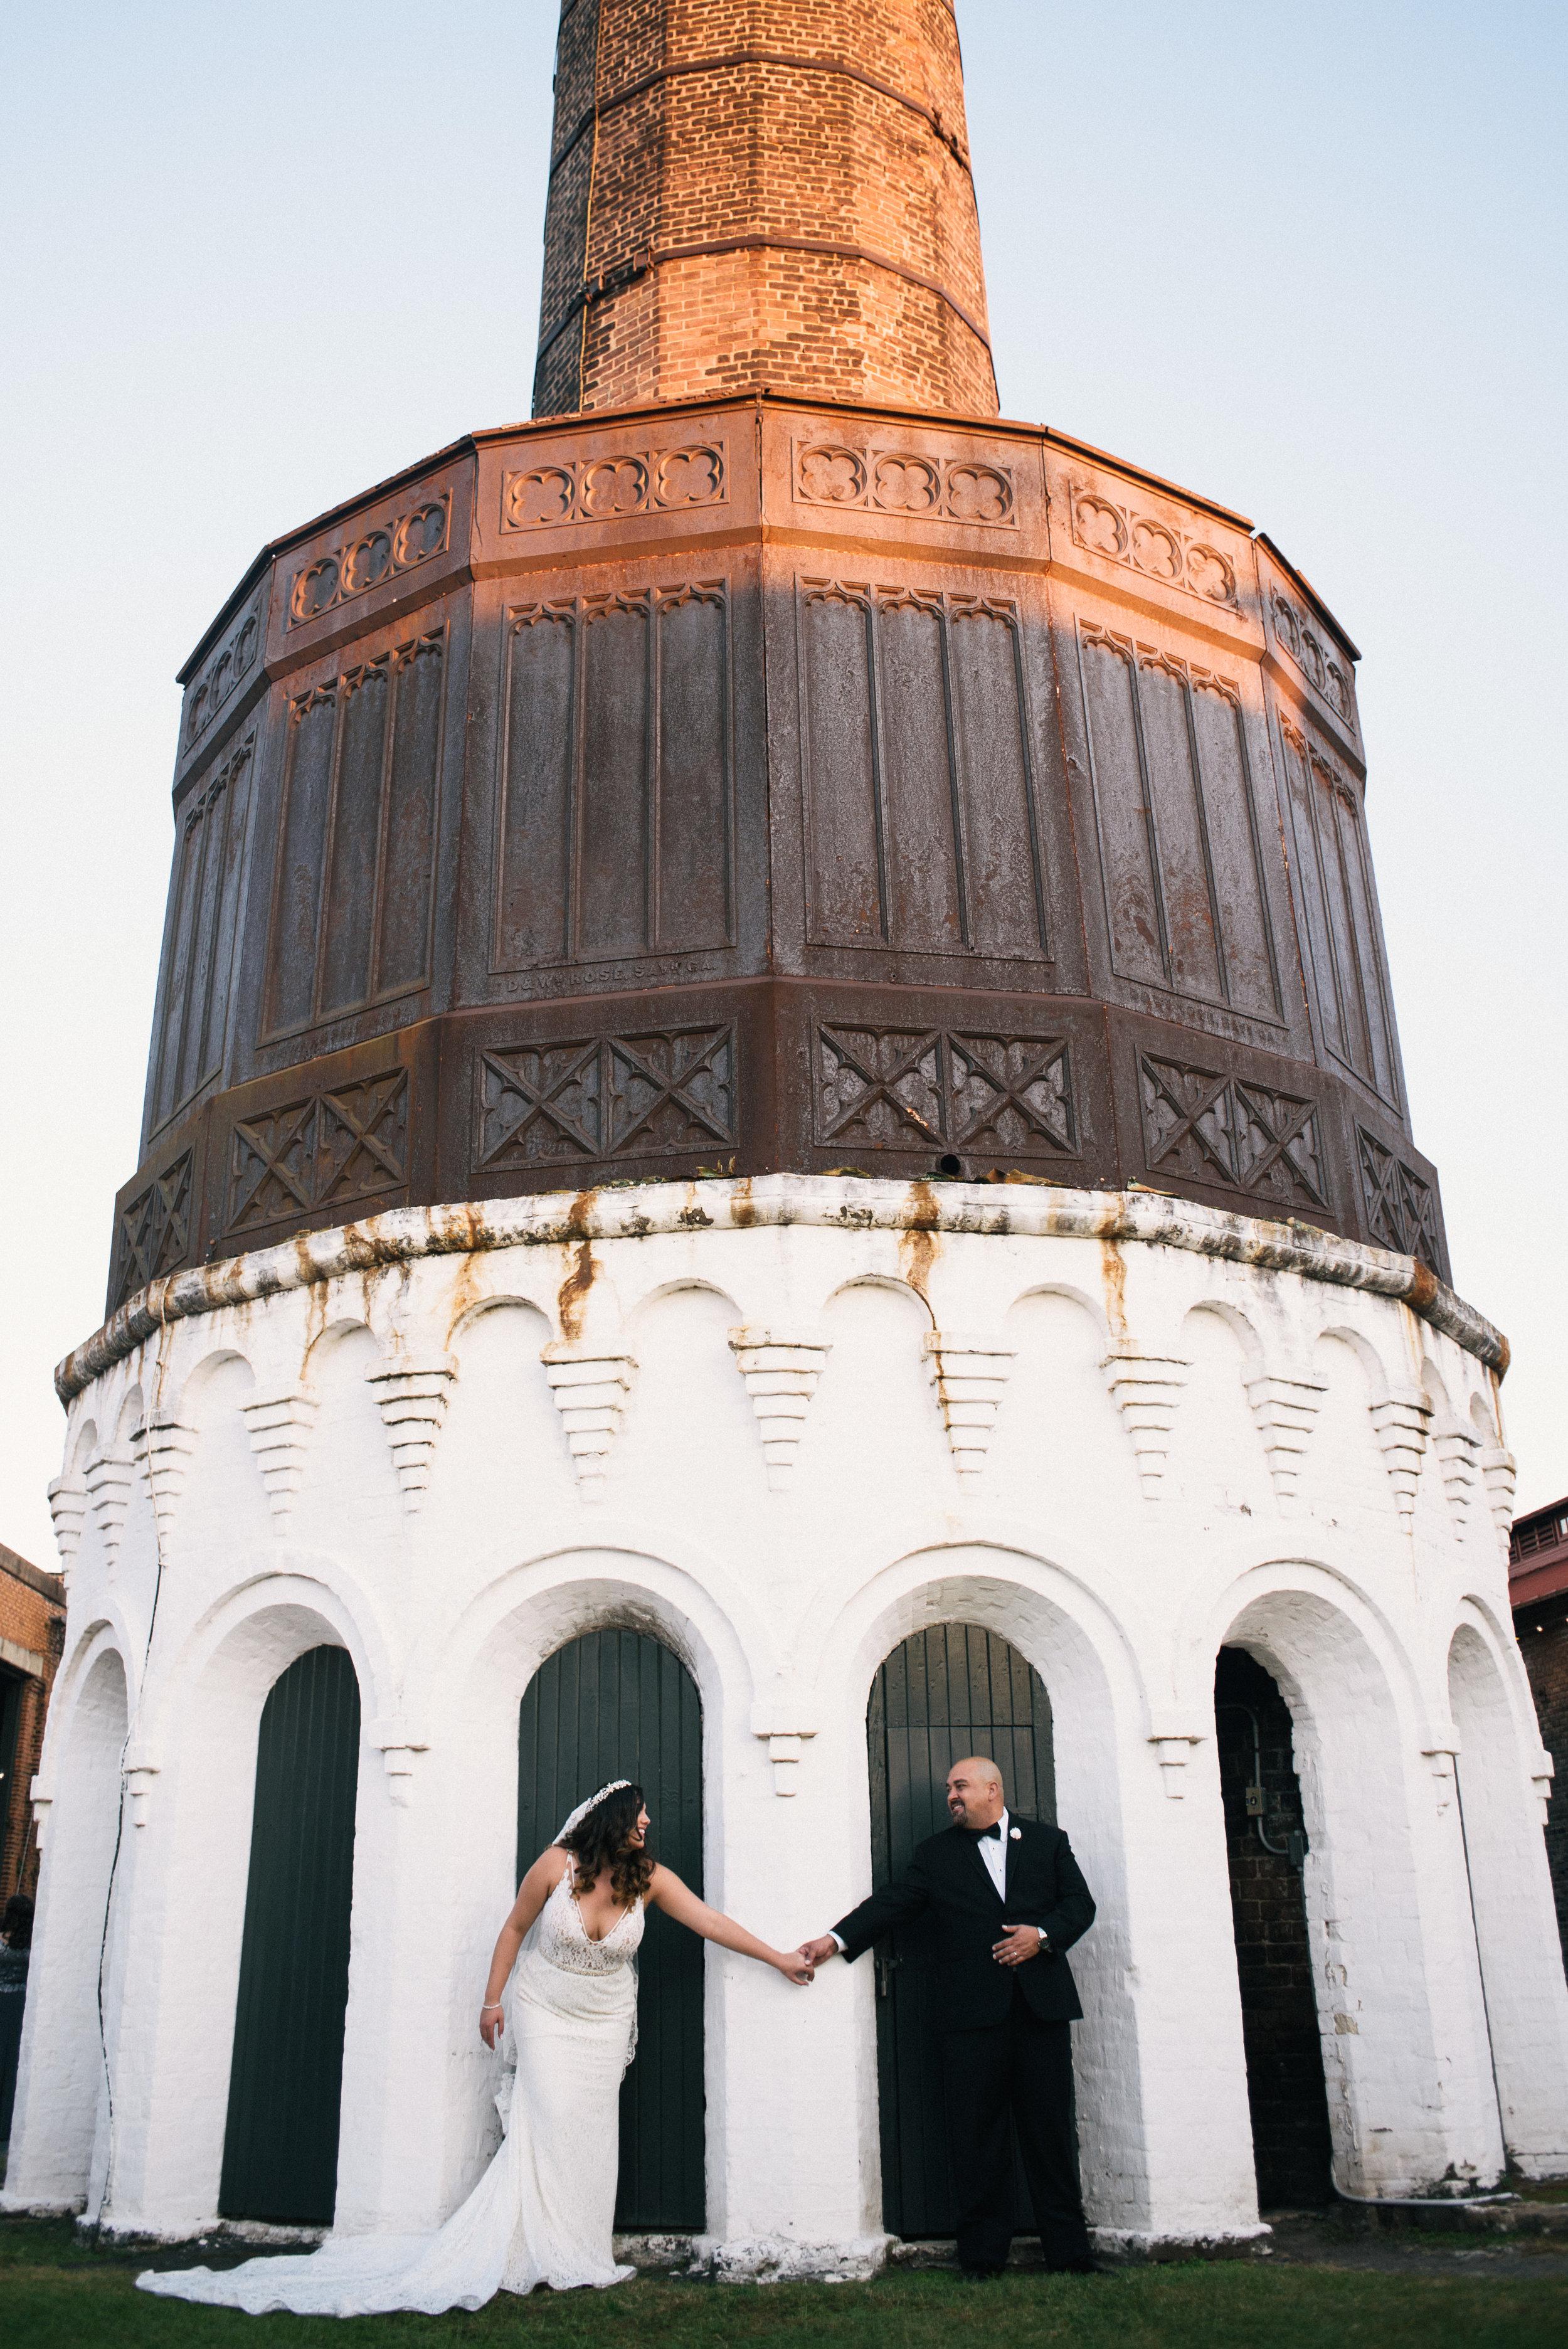 Iggy-and-yesenia-savannah-railroad-museum-wedding-meg-hill-photo- (709 of 1037).jpg